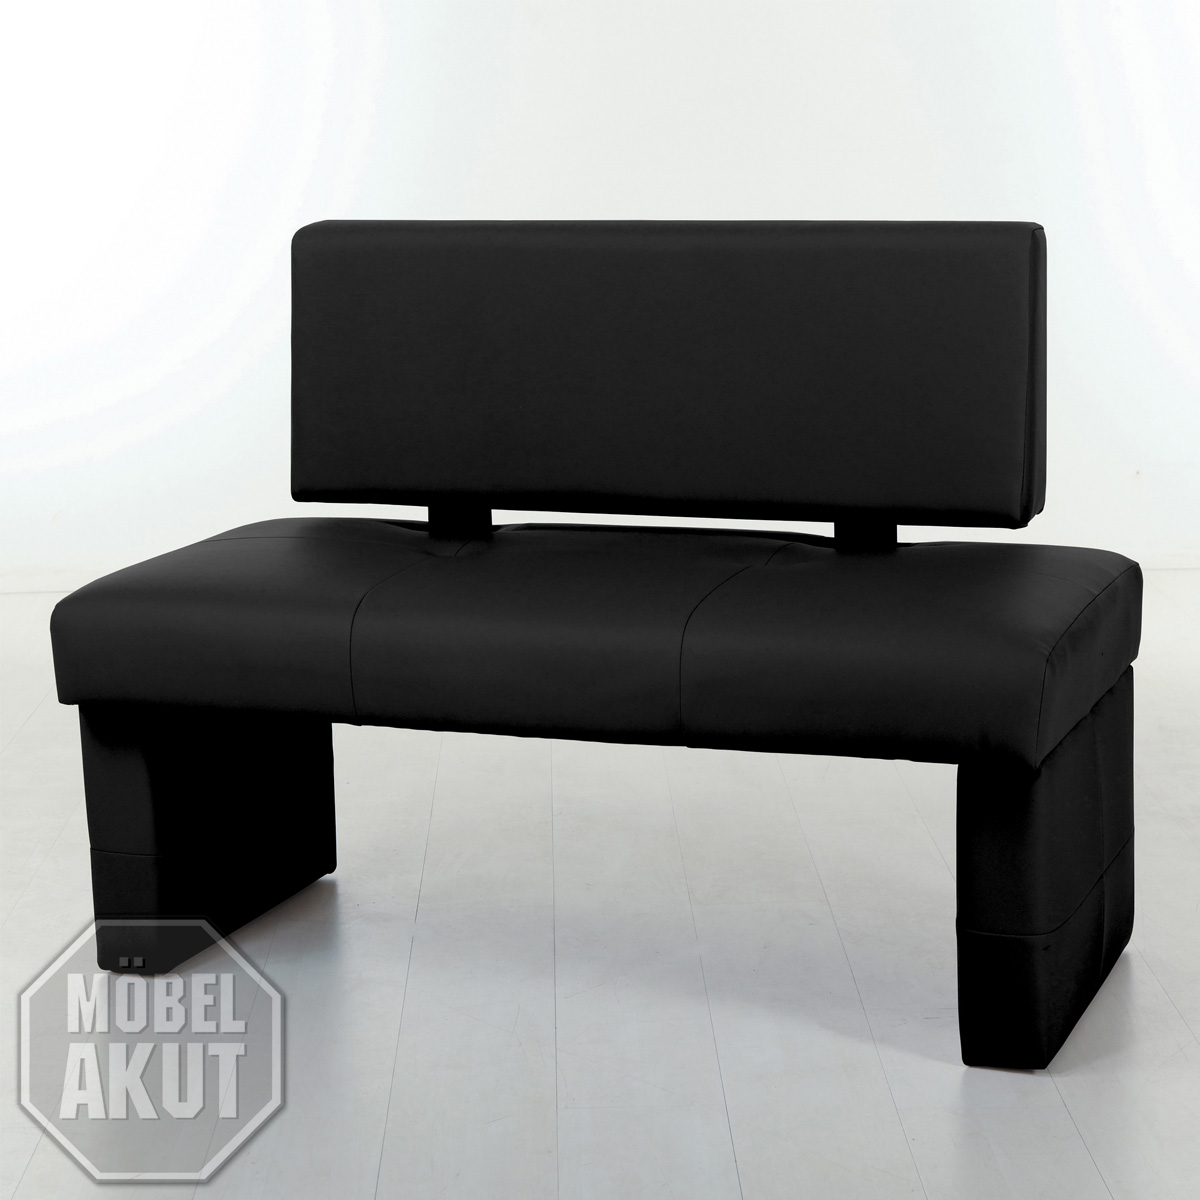 65423221407102 esszimmerbank schwarz. Black Bedroom Furniture Sets. Home Design Ideas